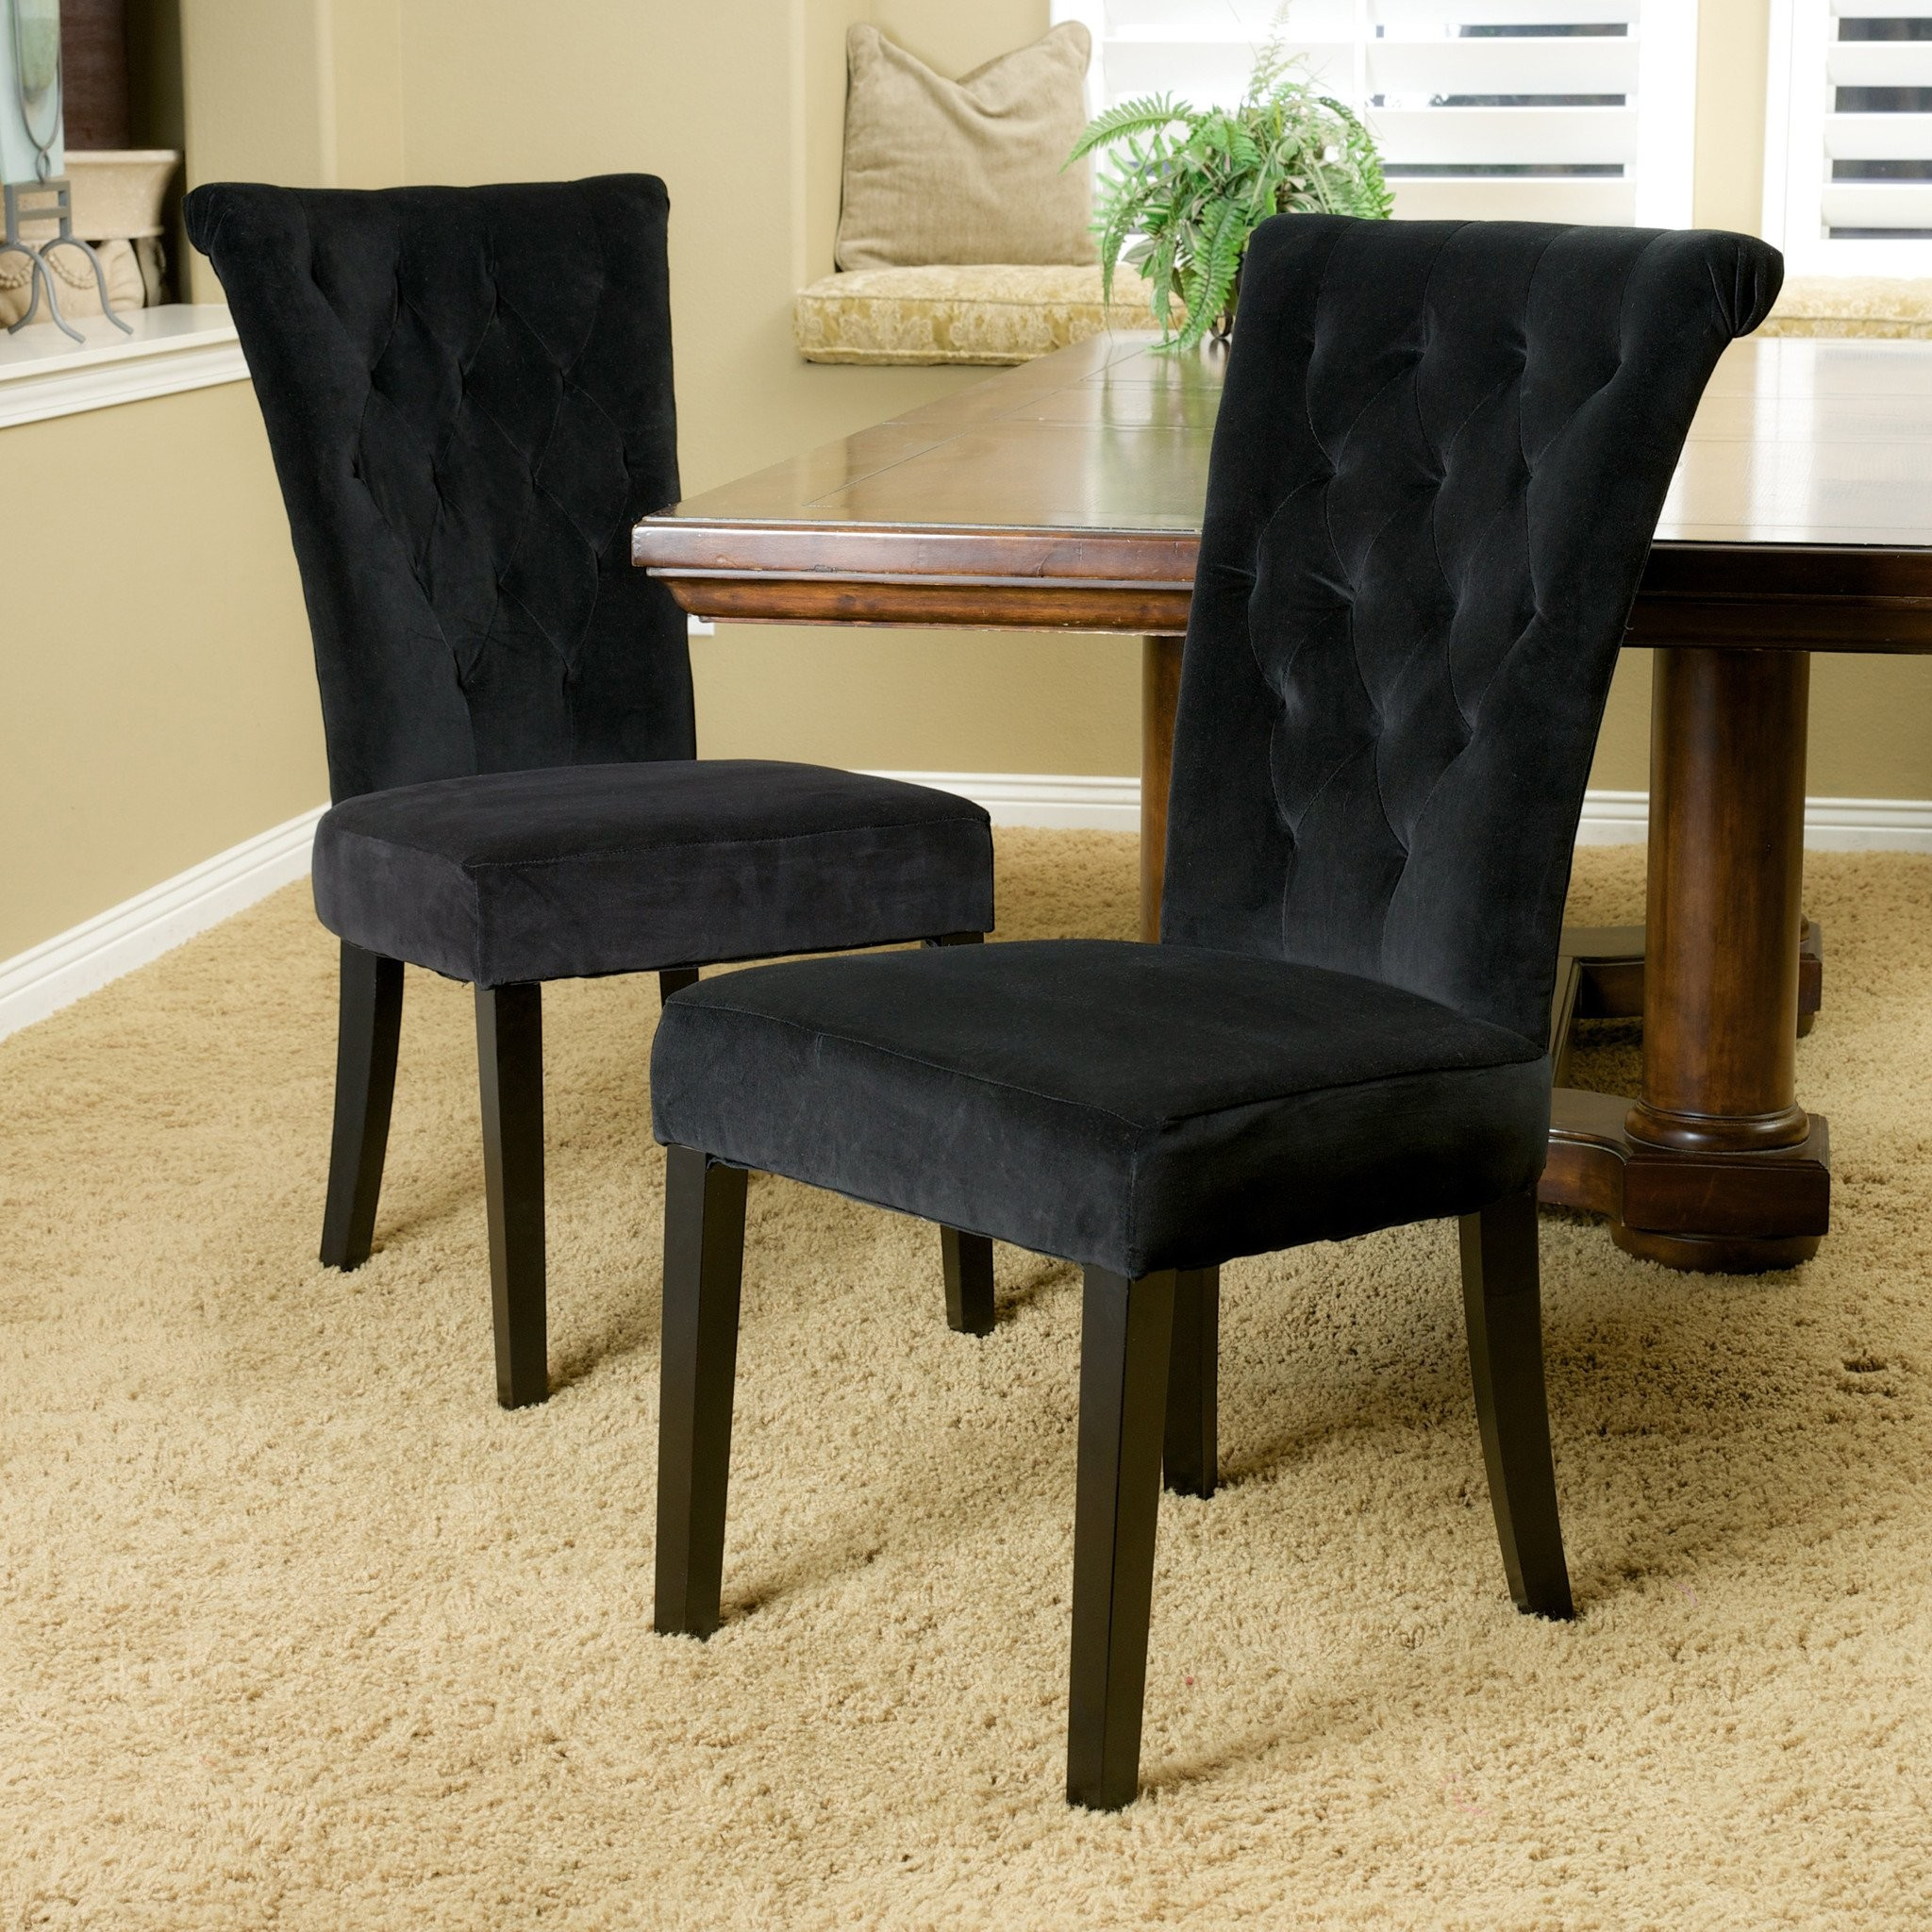 Paulina Black Velvet Dining Chairs (Set of 2)